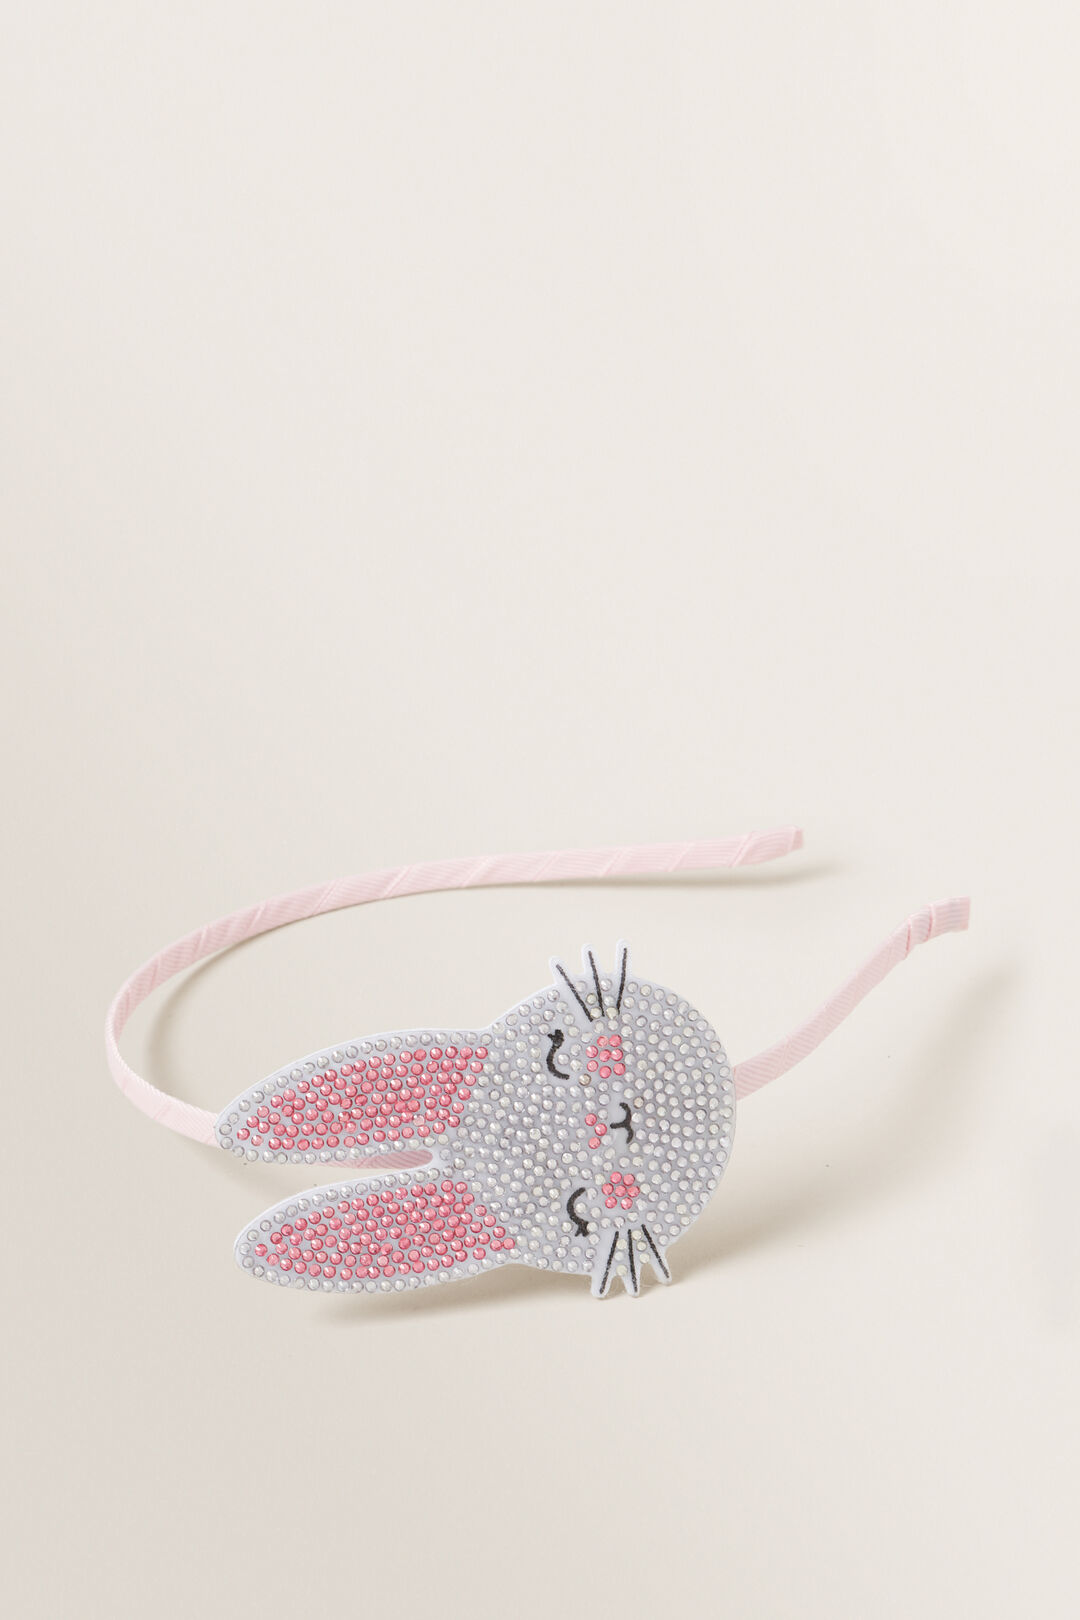 Gem Patch Bunny Headband  Multi  hi-res